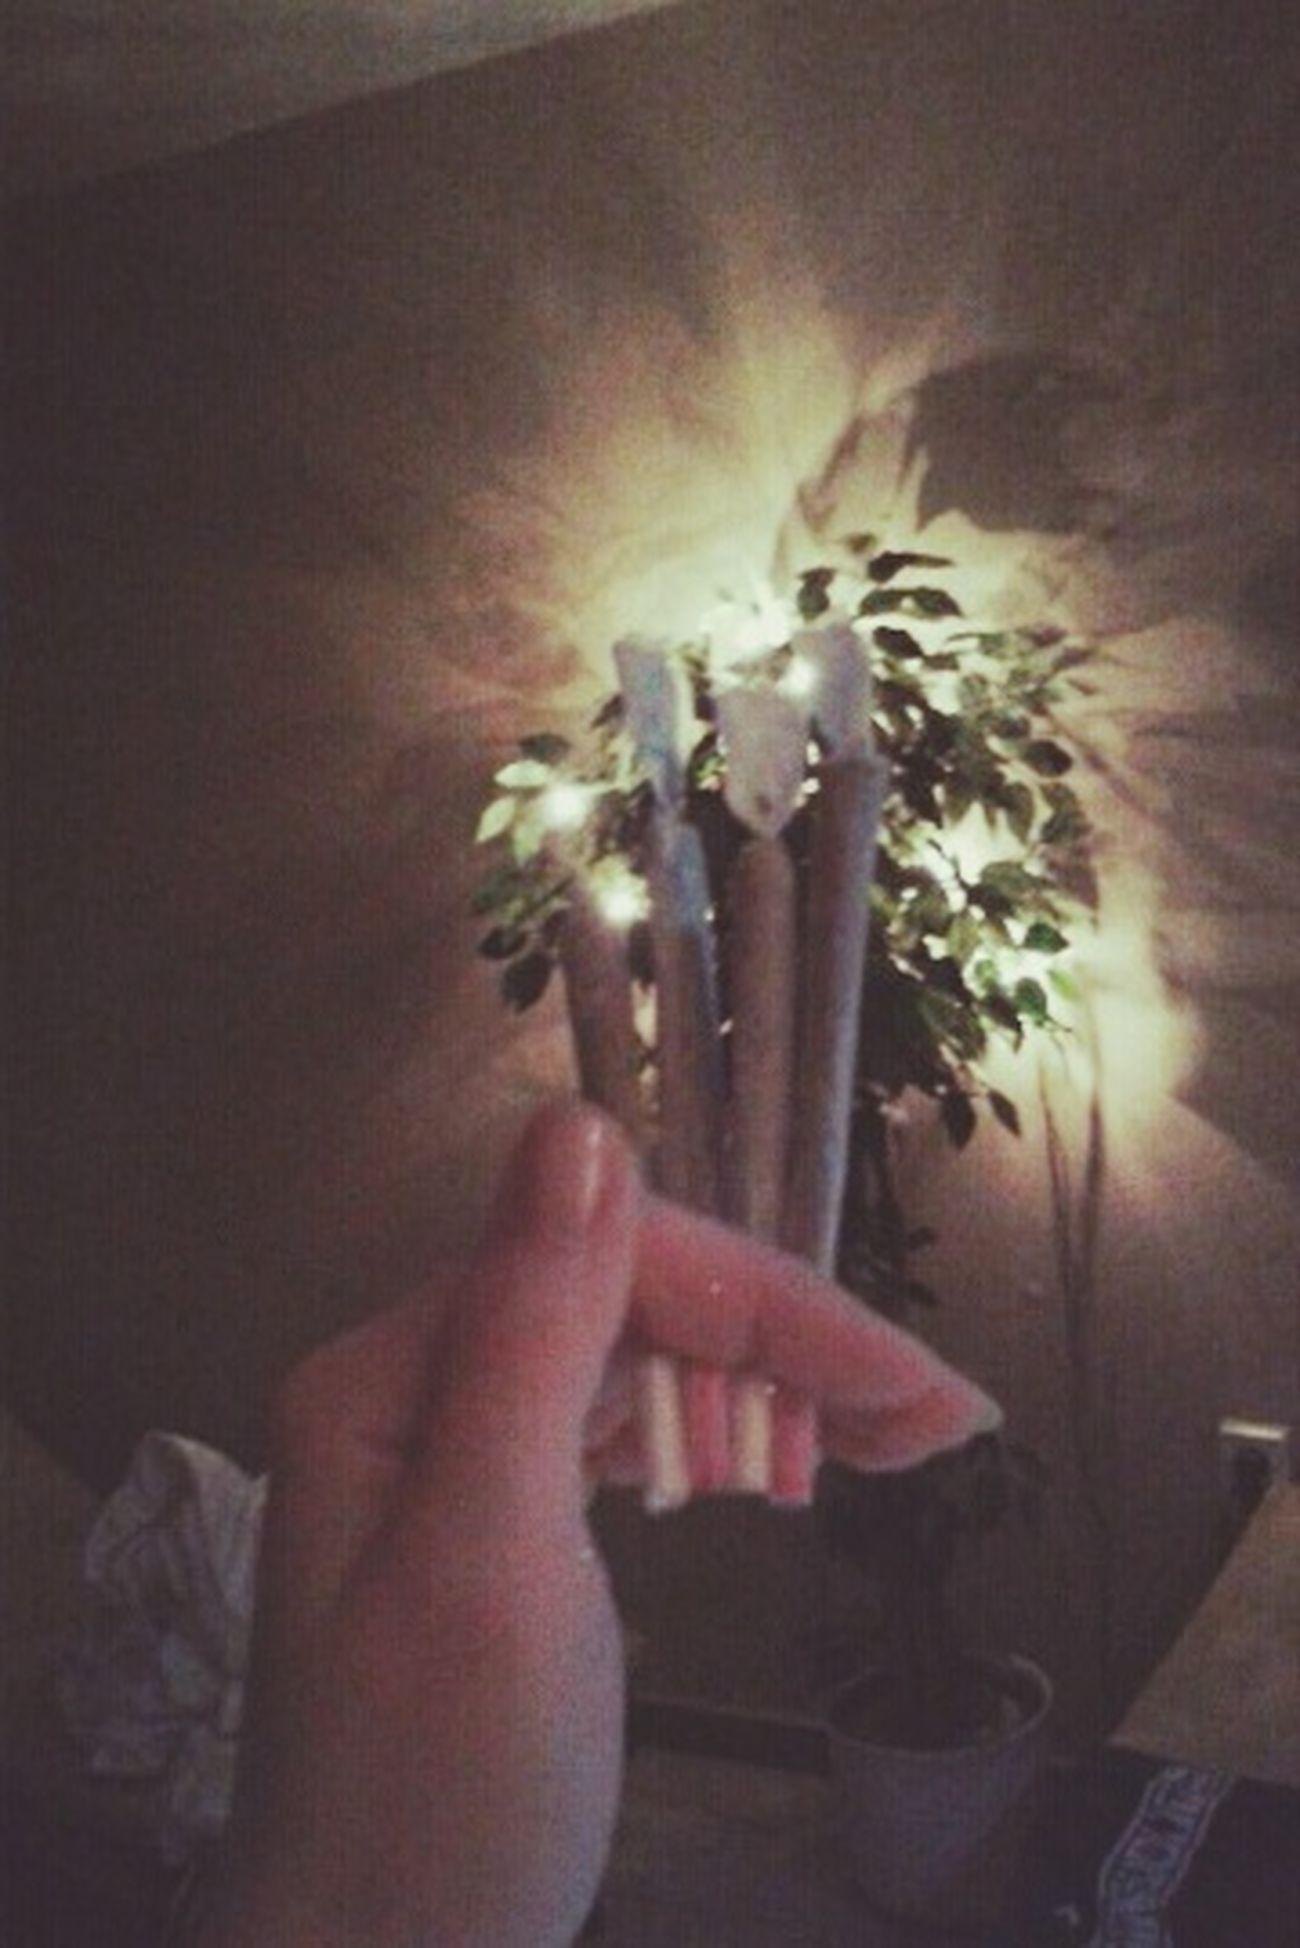 Chilling Girlnight Ladiesnight Thisishowwedo 420 Highlife Maryjaneinmyveins Relaxing Time